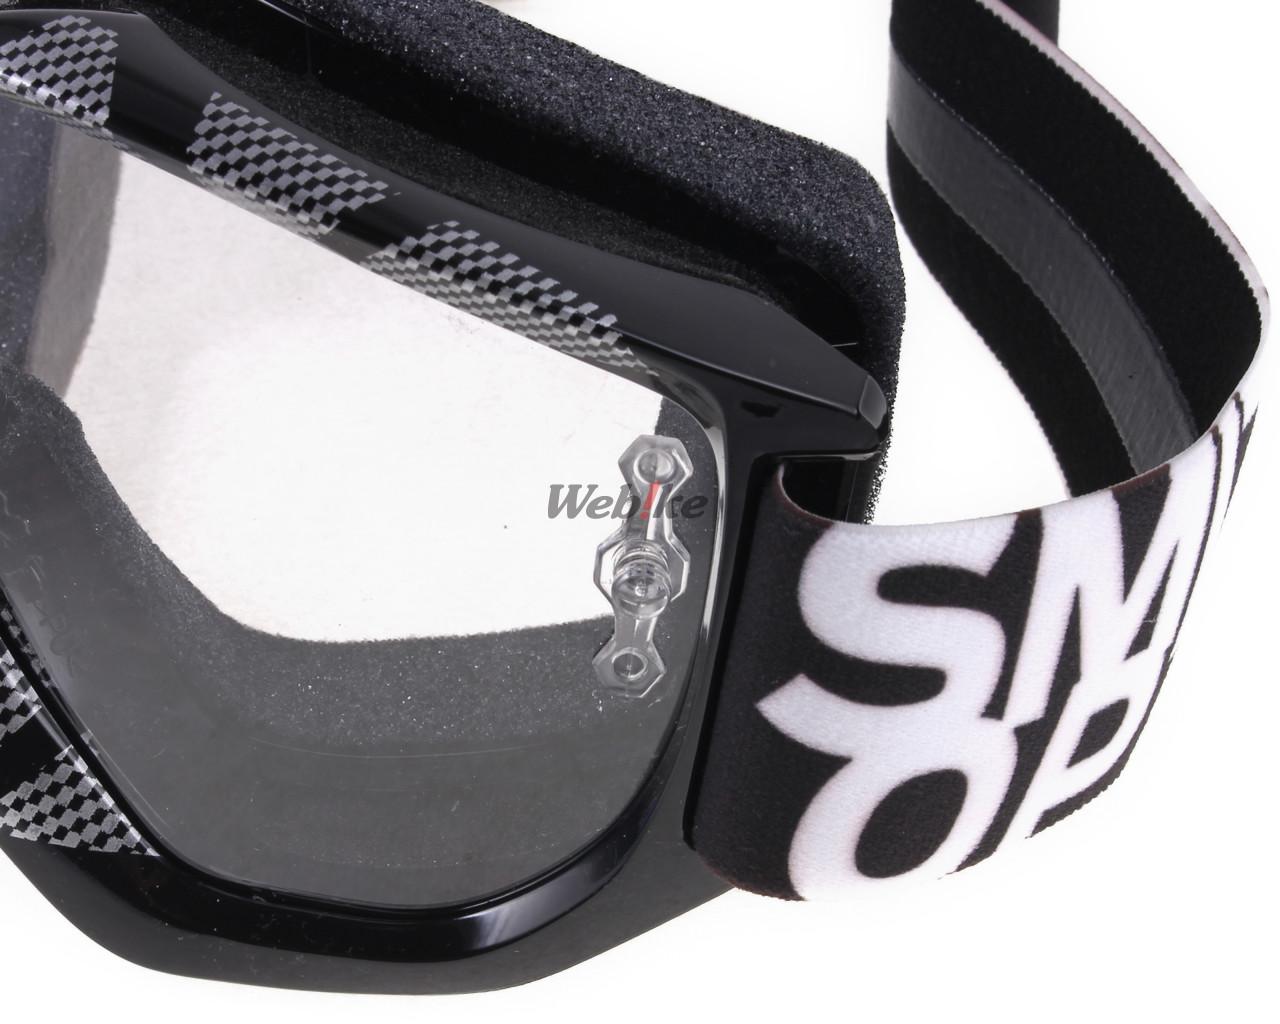 【SMITH】OPTION OTG 越野風鏡 - 「Webike-摩托百貨」